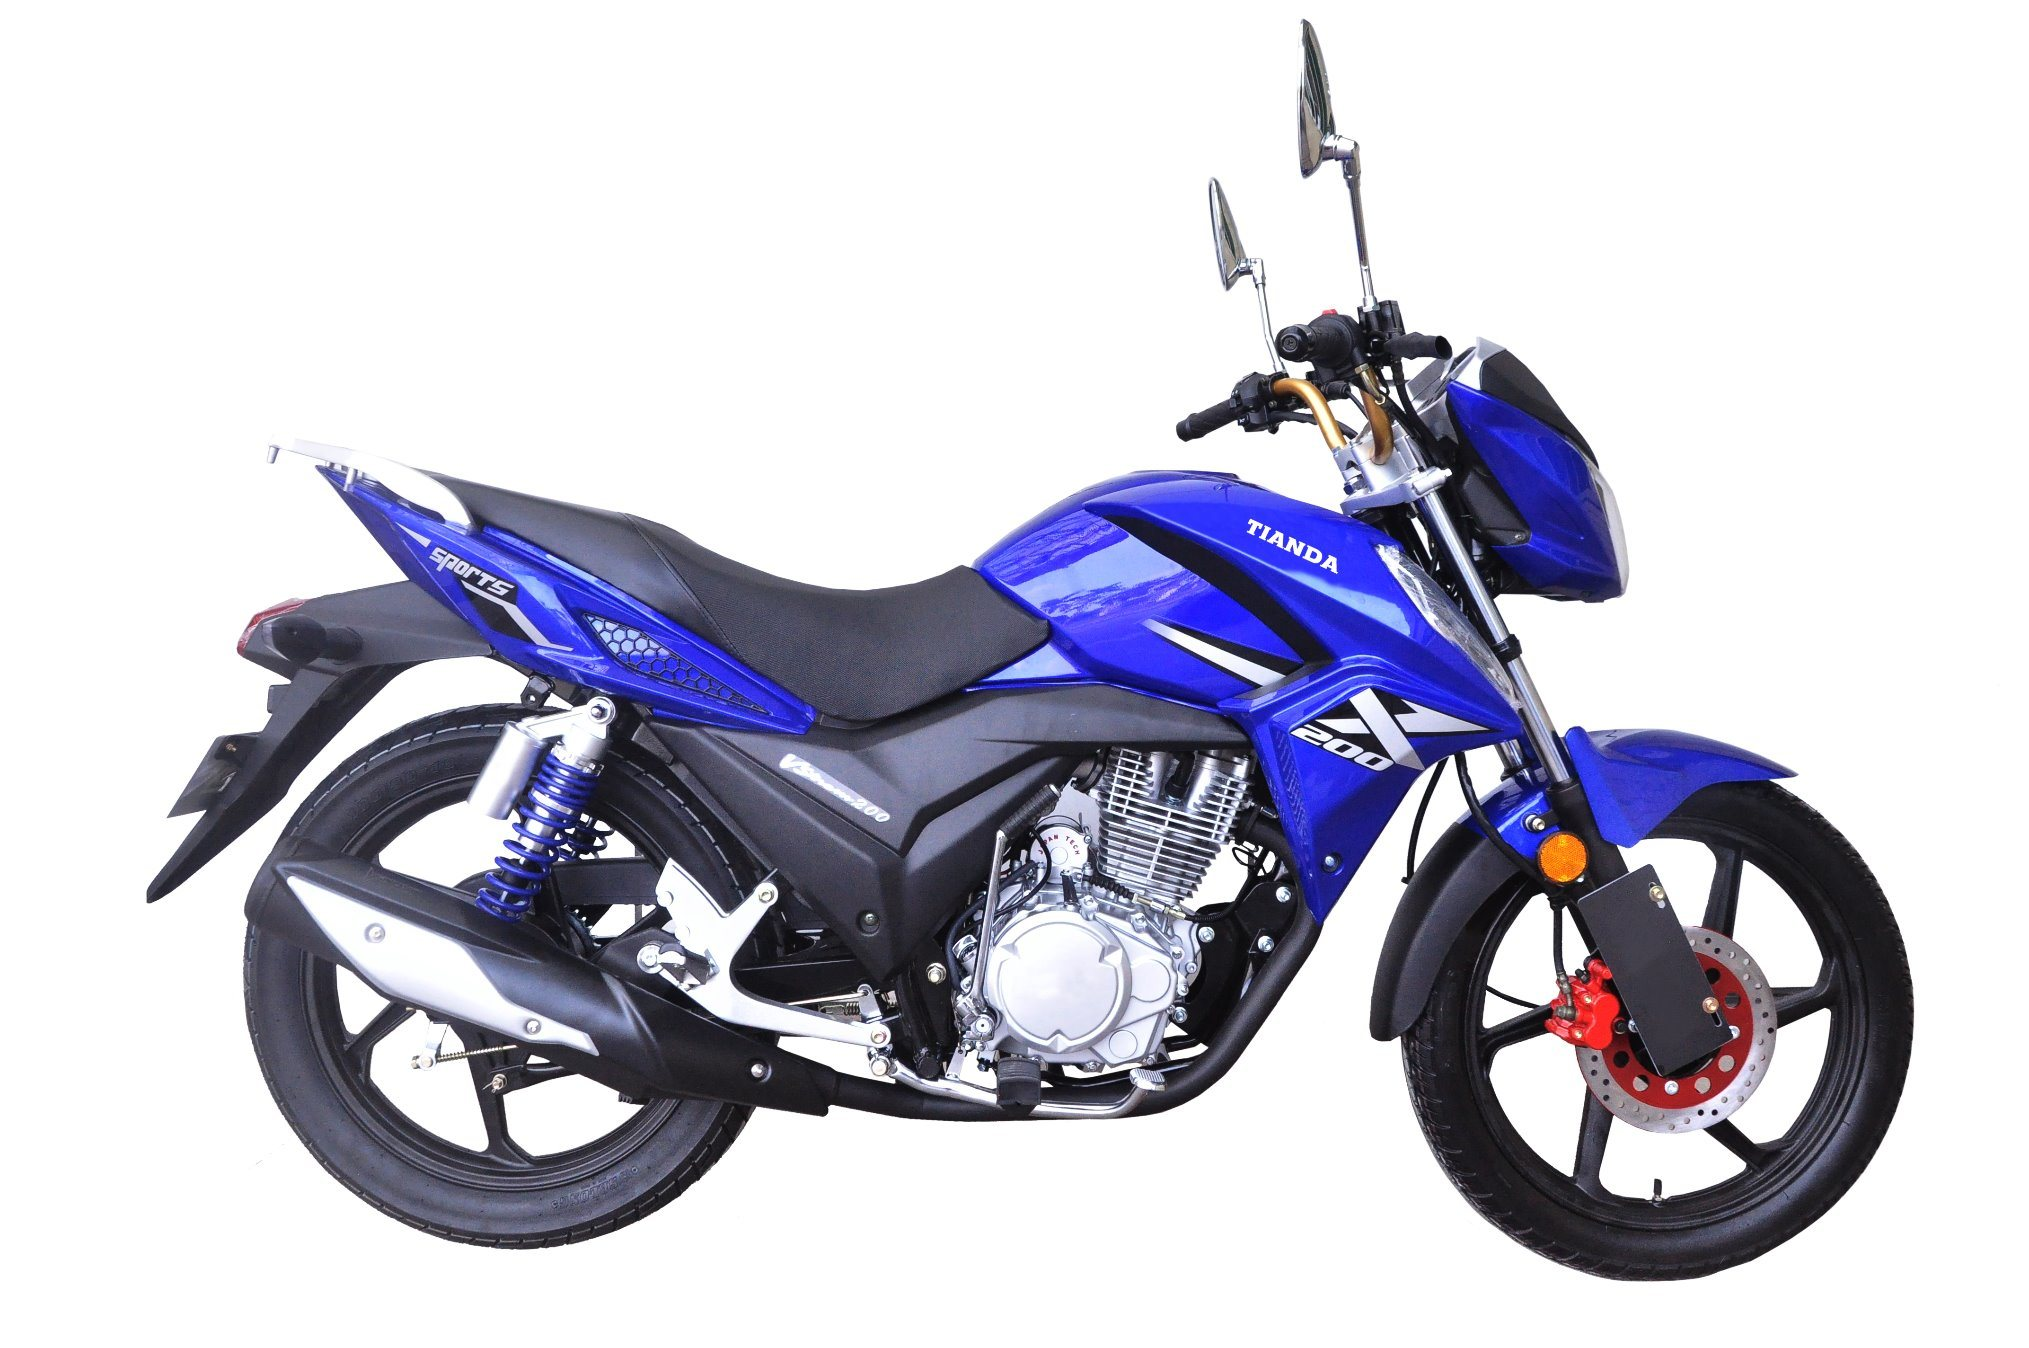 China Hongda X150 Street Motorcycle